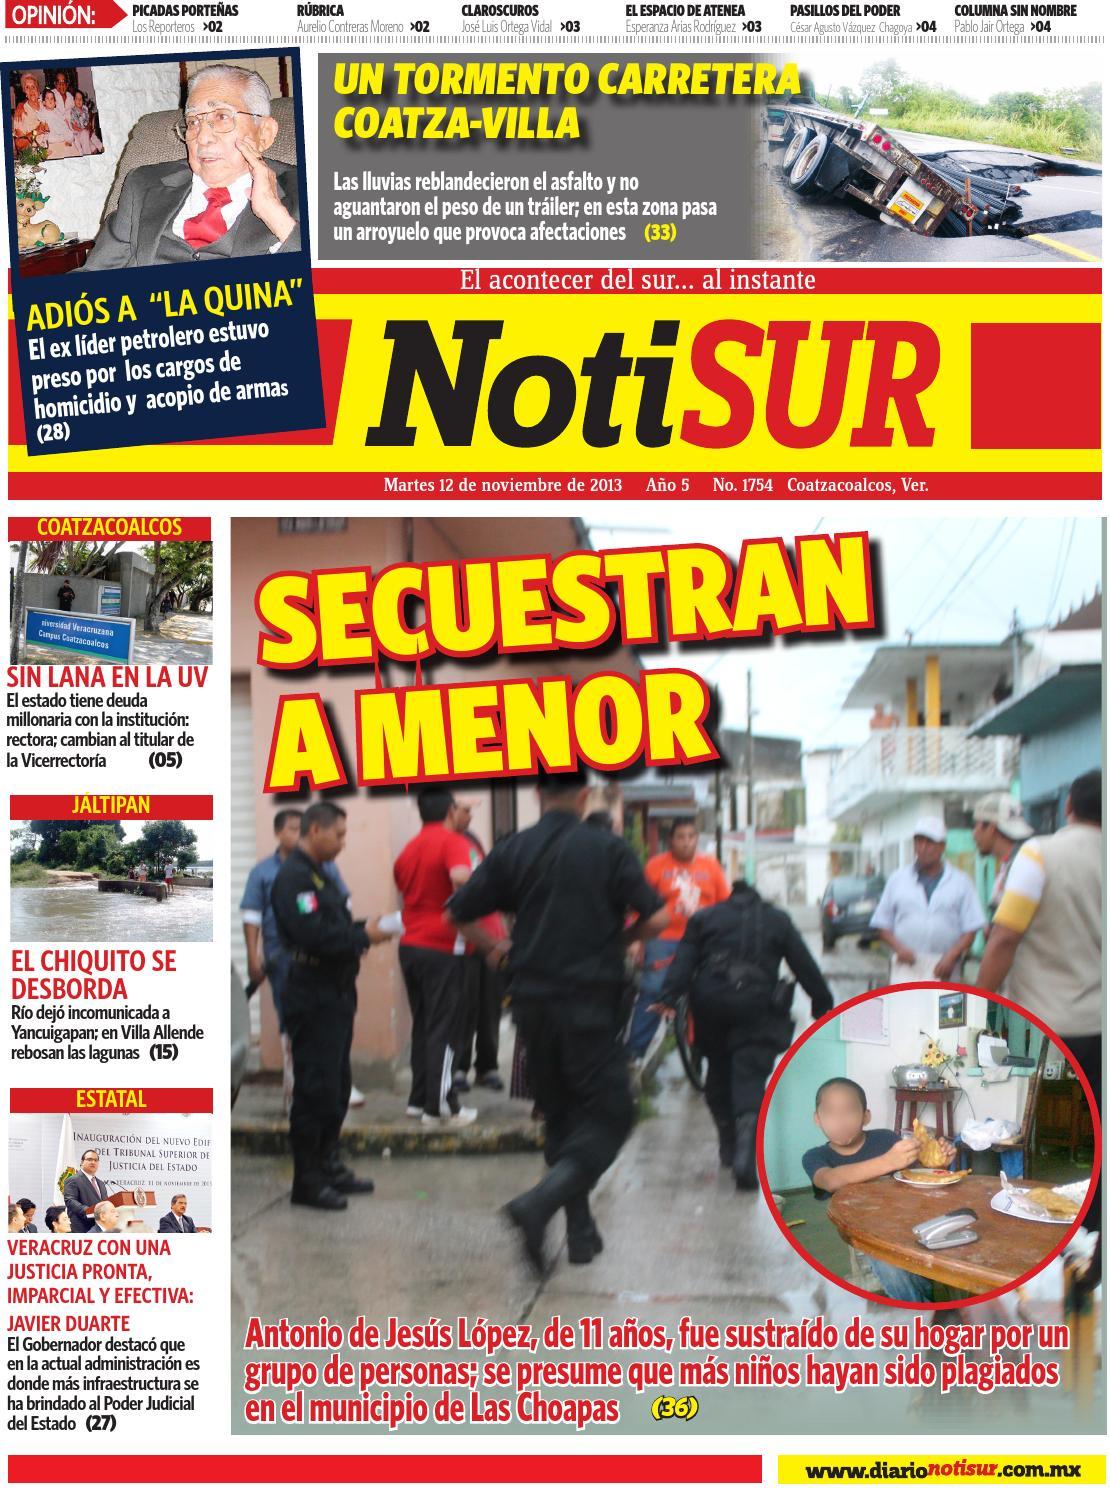 Notisur 12 De Noviembre 2013 By Diario Notisur Coatzacoalcos 2013  # Muebles Mayoral Tonala